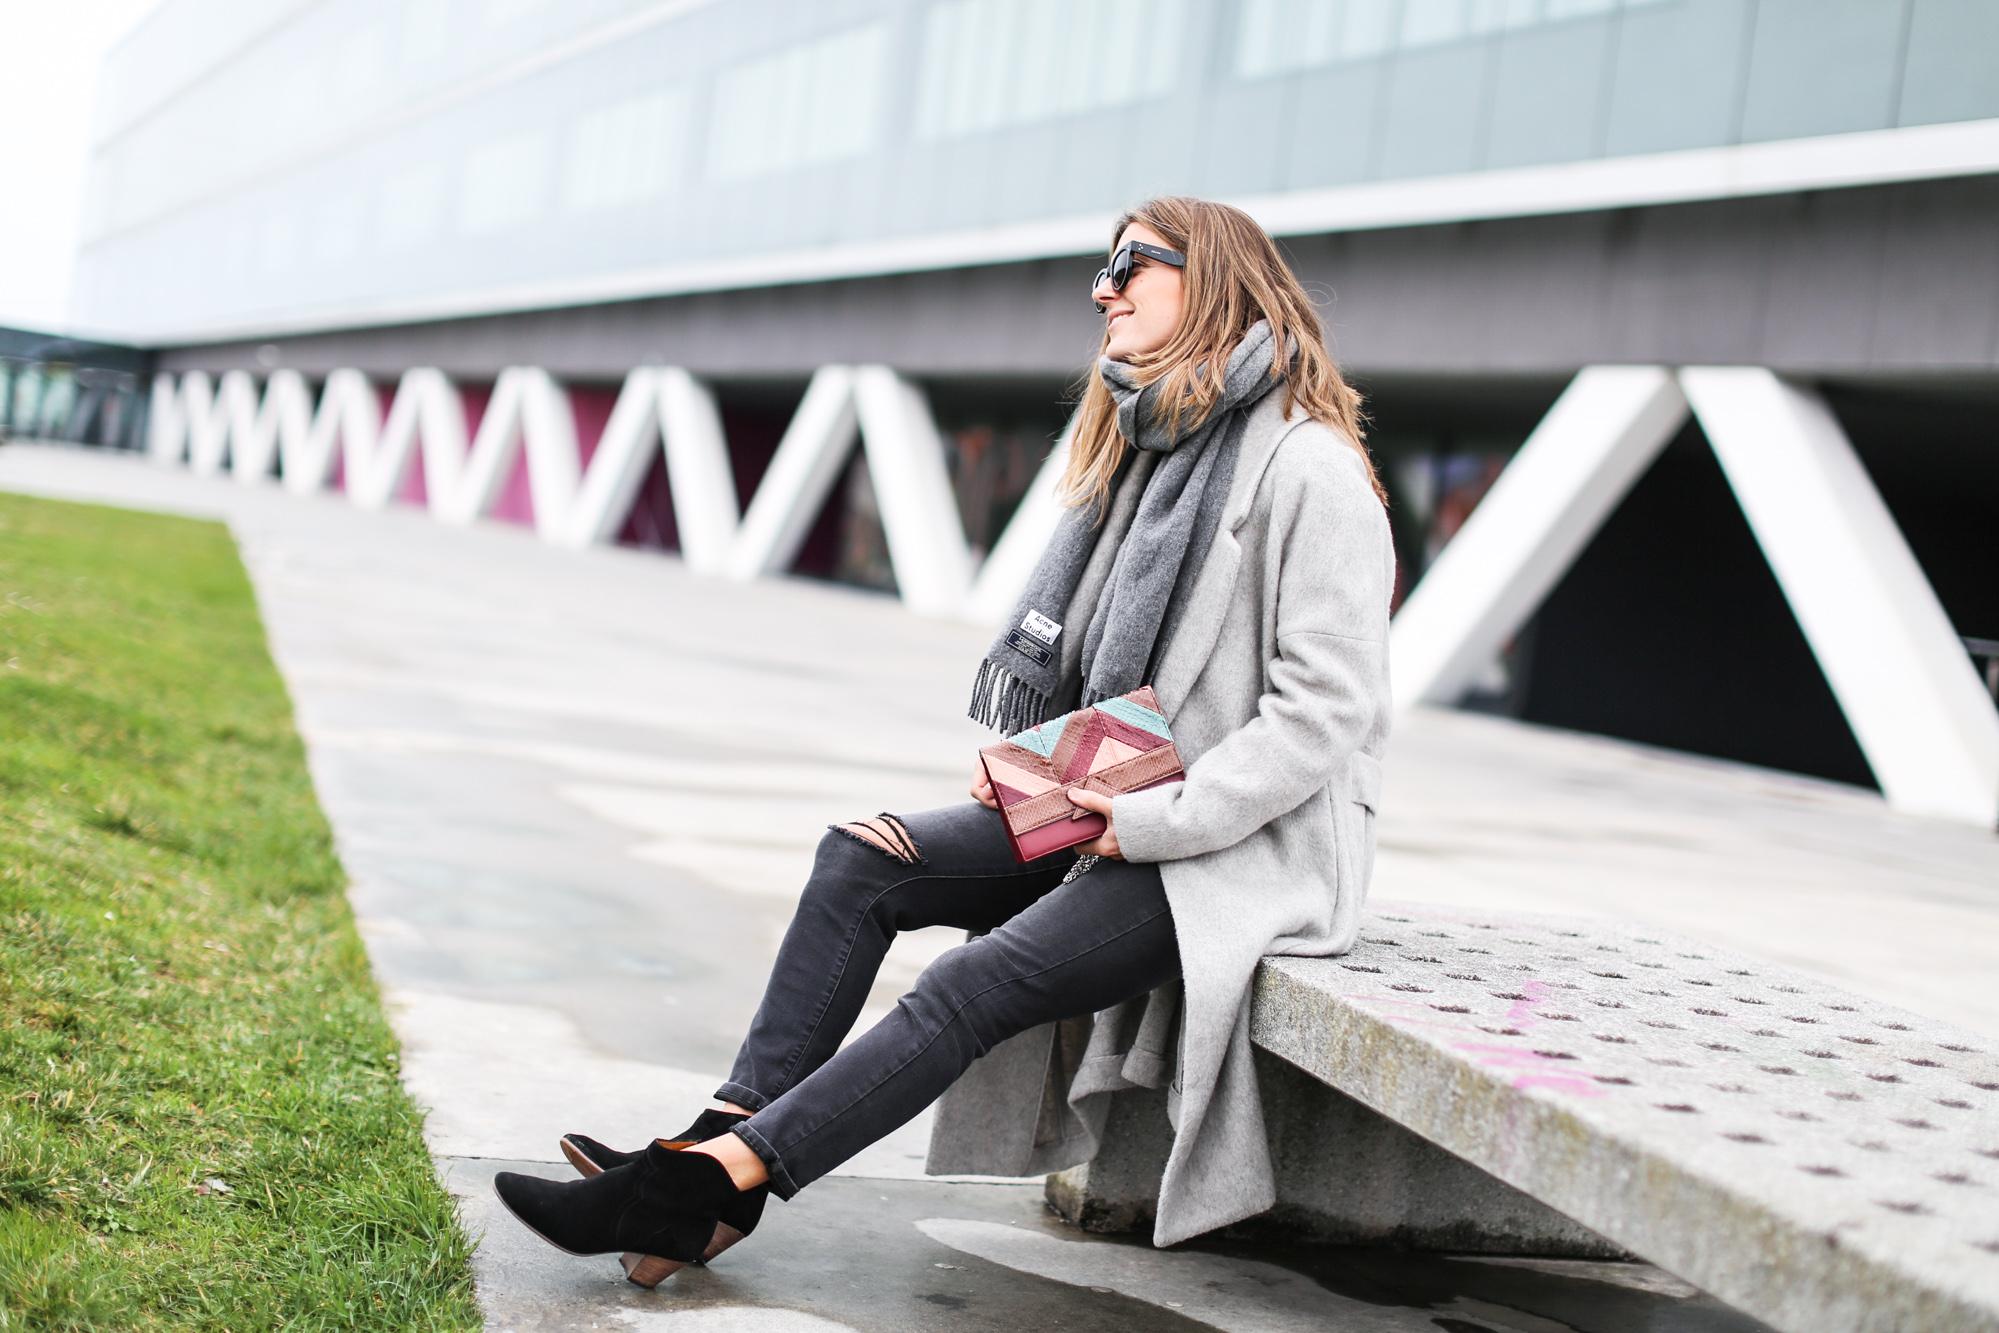 Clochet_streetstyle_fashionblogger_abrigolargogrislanamango_isabelmarantdicker_sudaderalazoclaudiepierlot-7